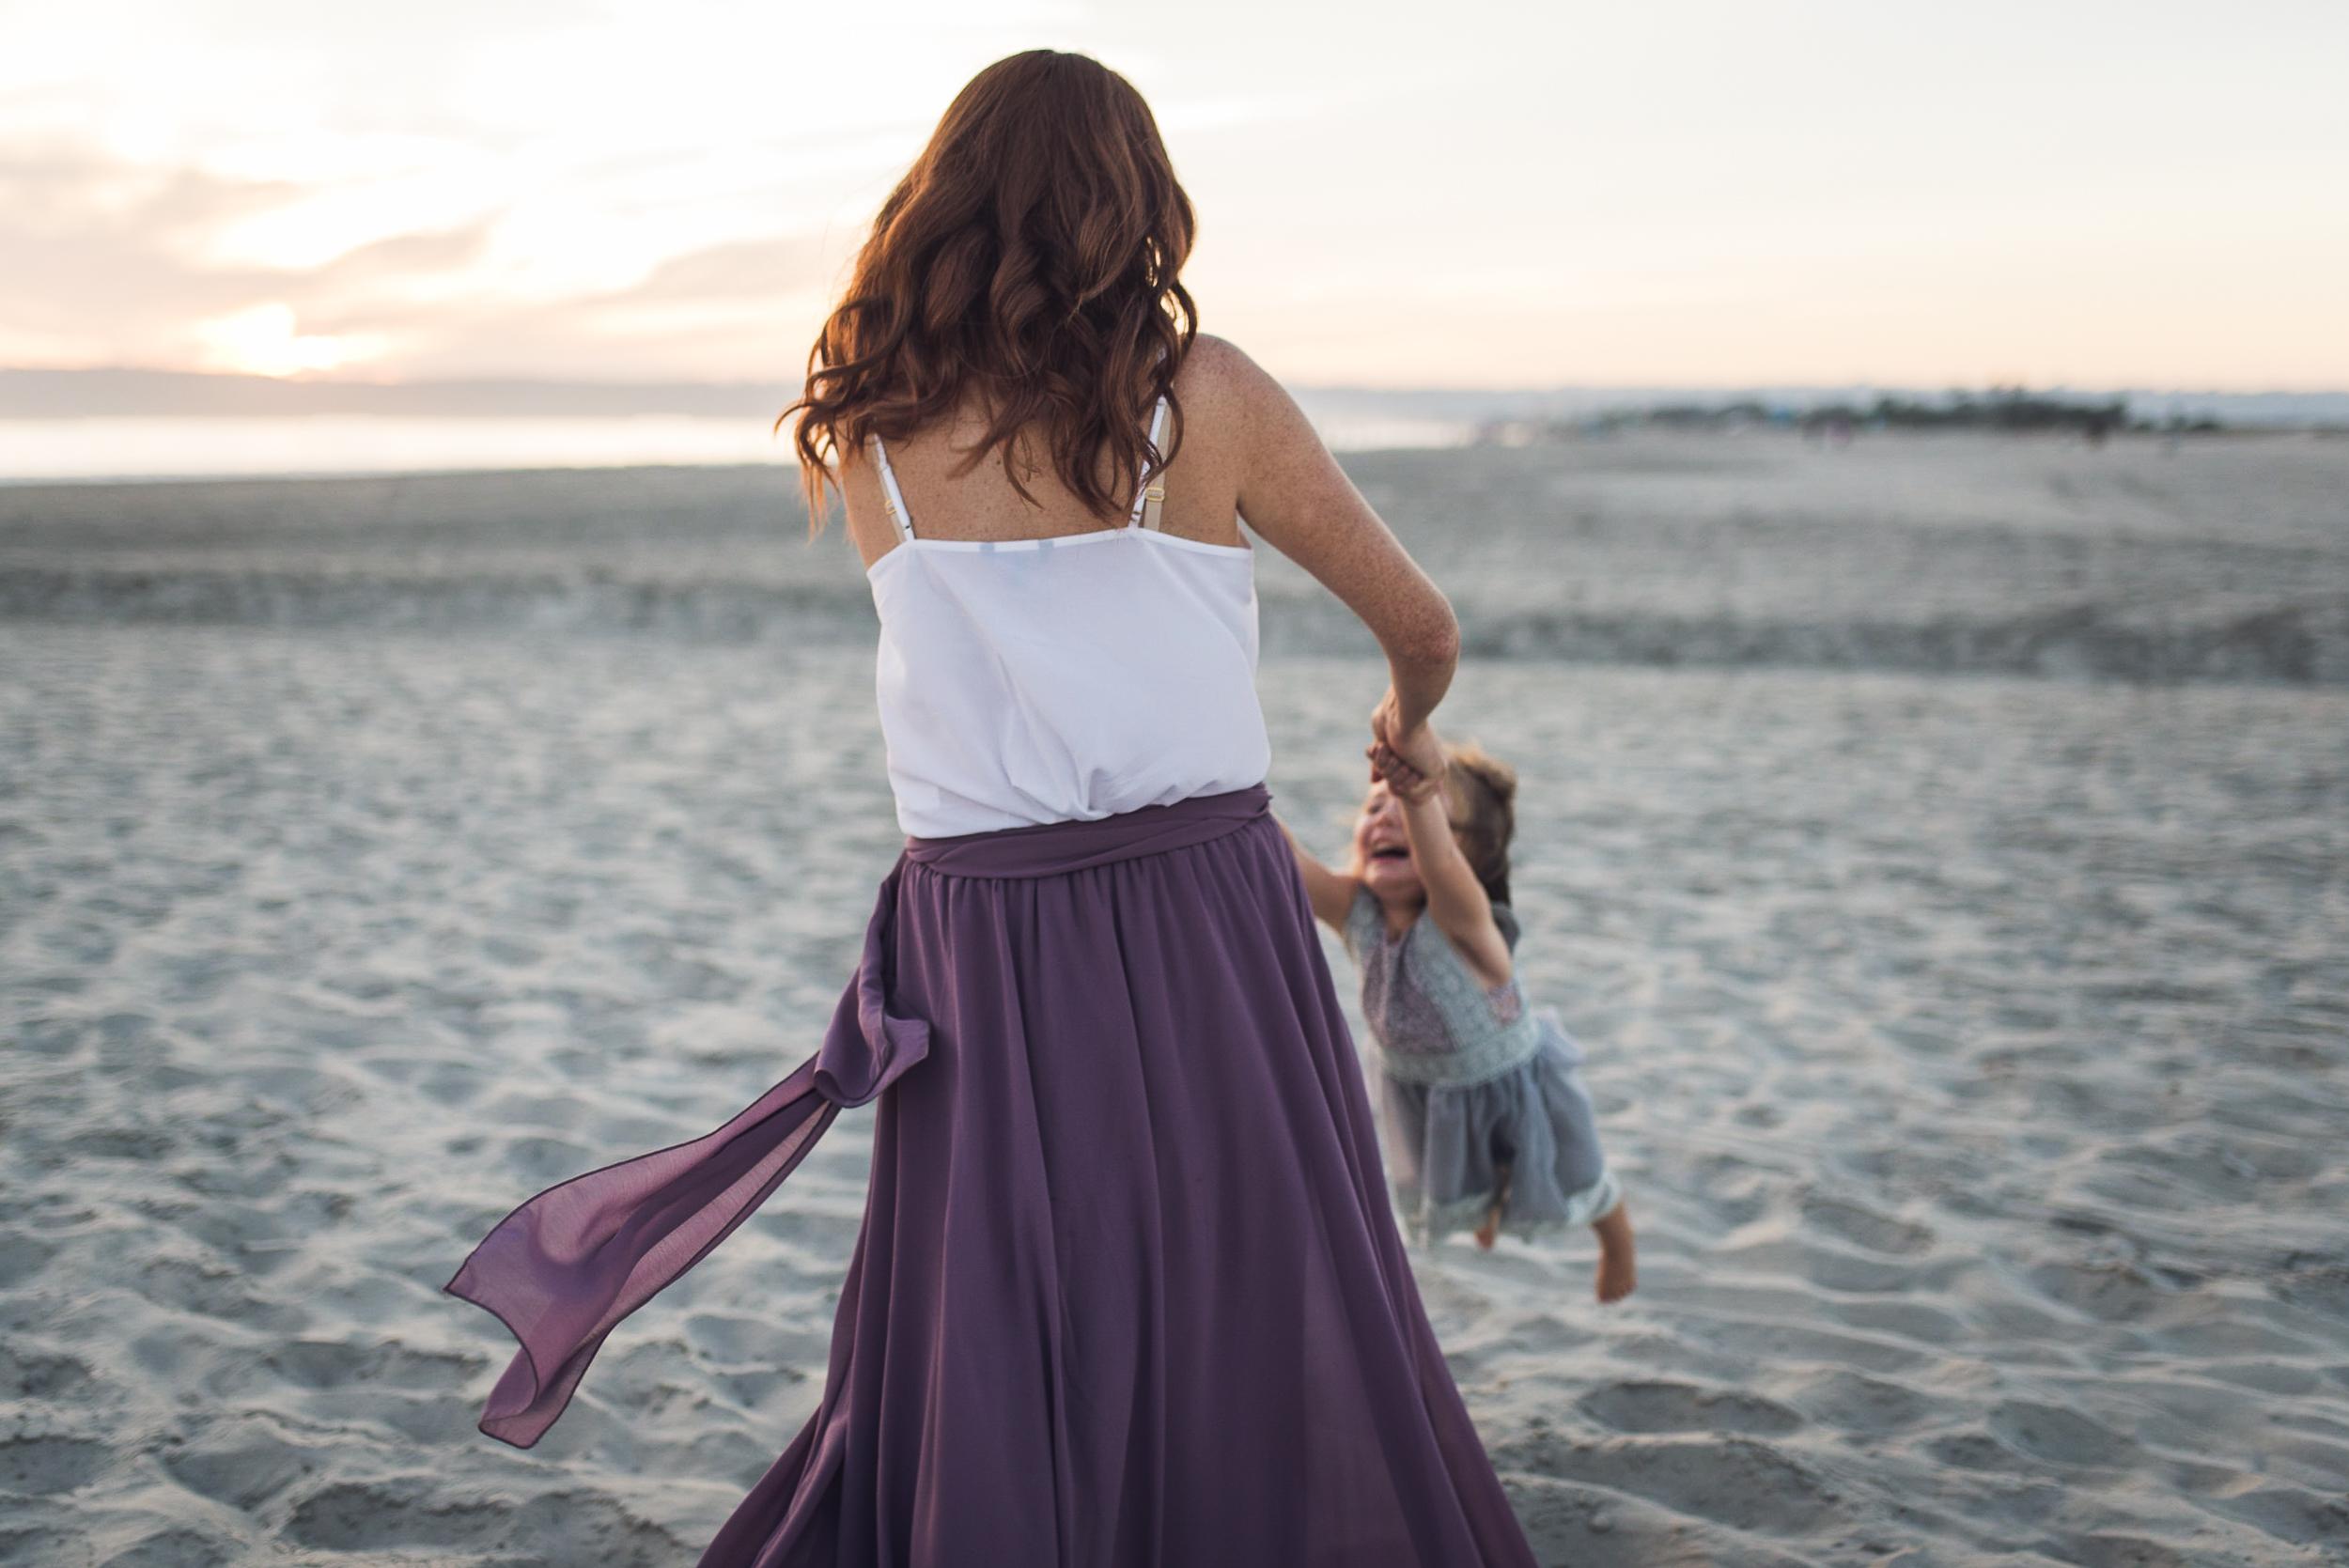 2018-San-Diego-Family-Lifestyle-Newborn-Travel-Vacation-Photographer-Kelsey-Smith-Photography-Coronado-La-Jolla-Encinitas-Solana-Beach-Del-Mar-204.jpg